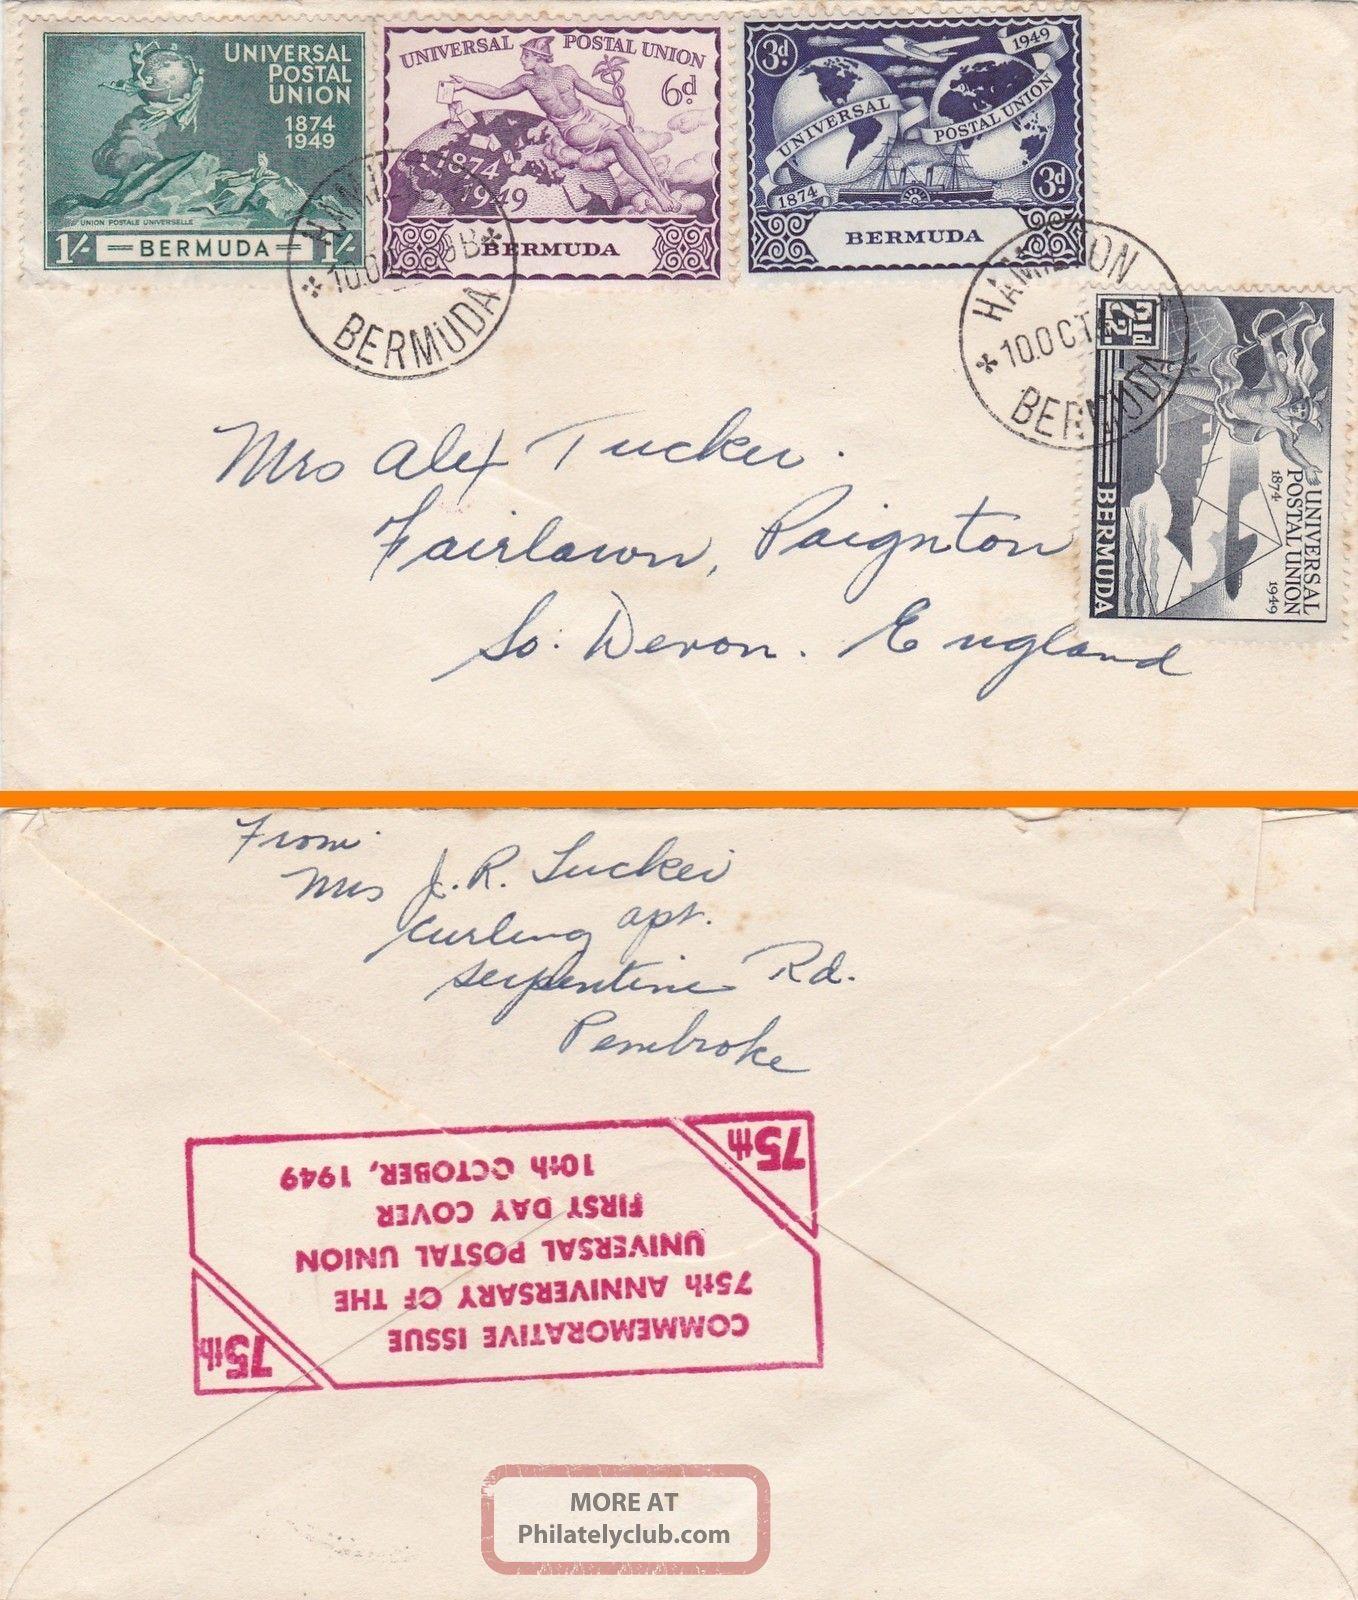 Bermuda : Universal Postal Union 75th Anniversary First Day Cover (1949) British Colonies & Territories photo